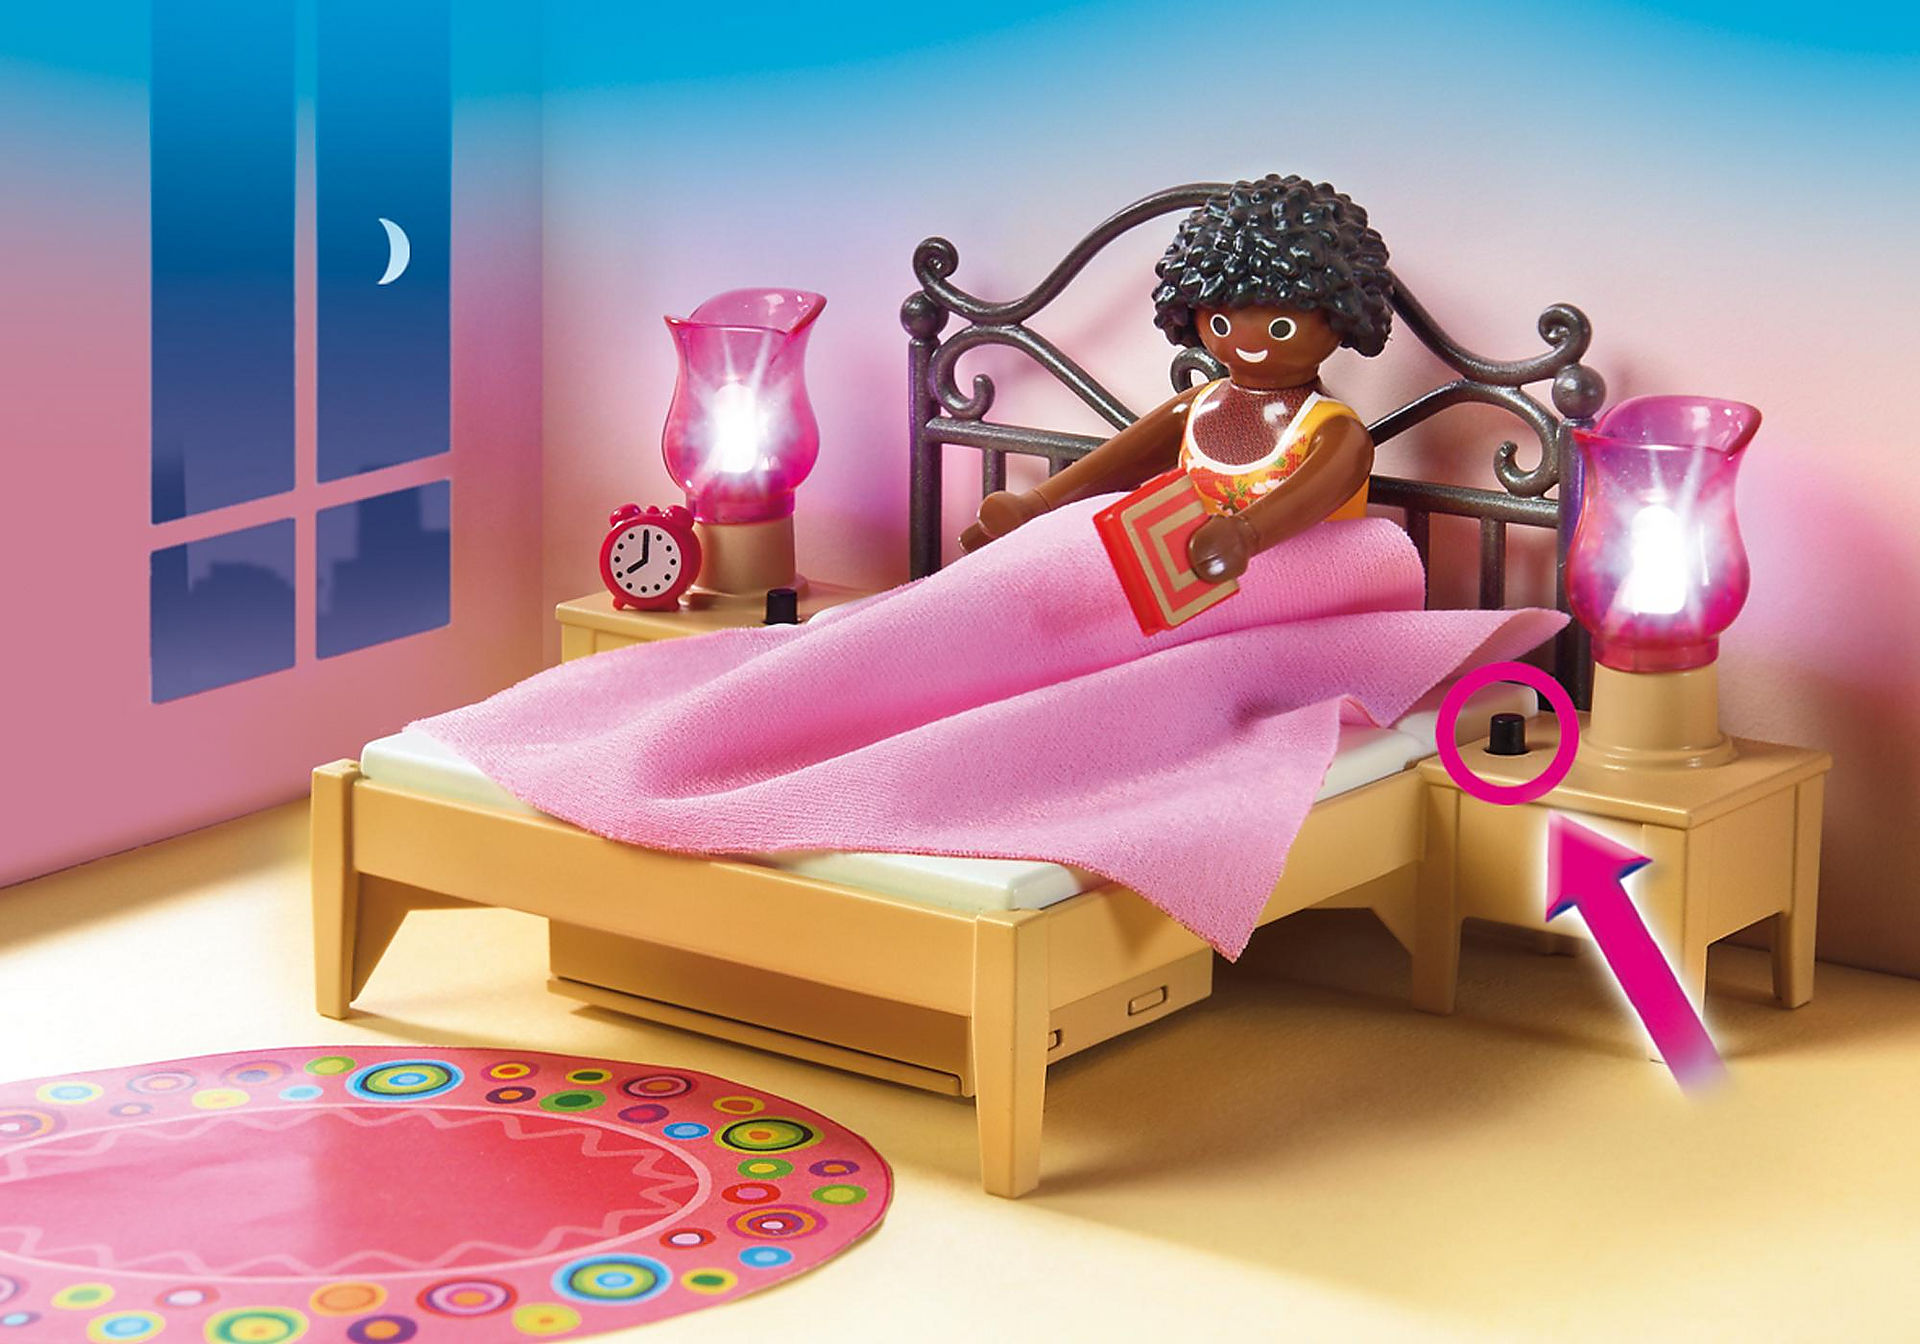 http://media.playmobil.com/i/playmobil/5309_product_extra2/Schlafzimmer mit Schminktischchen